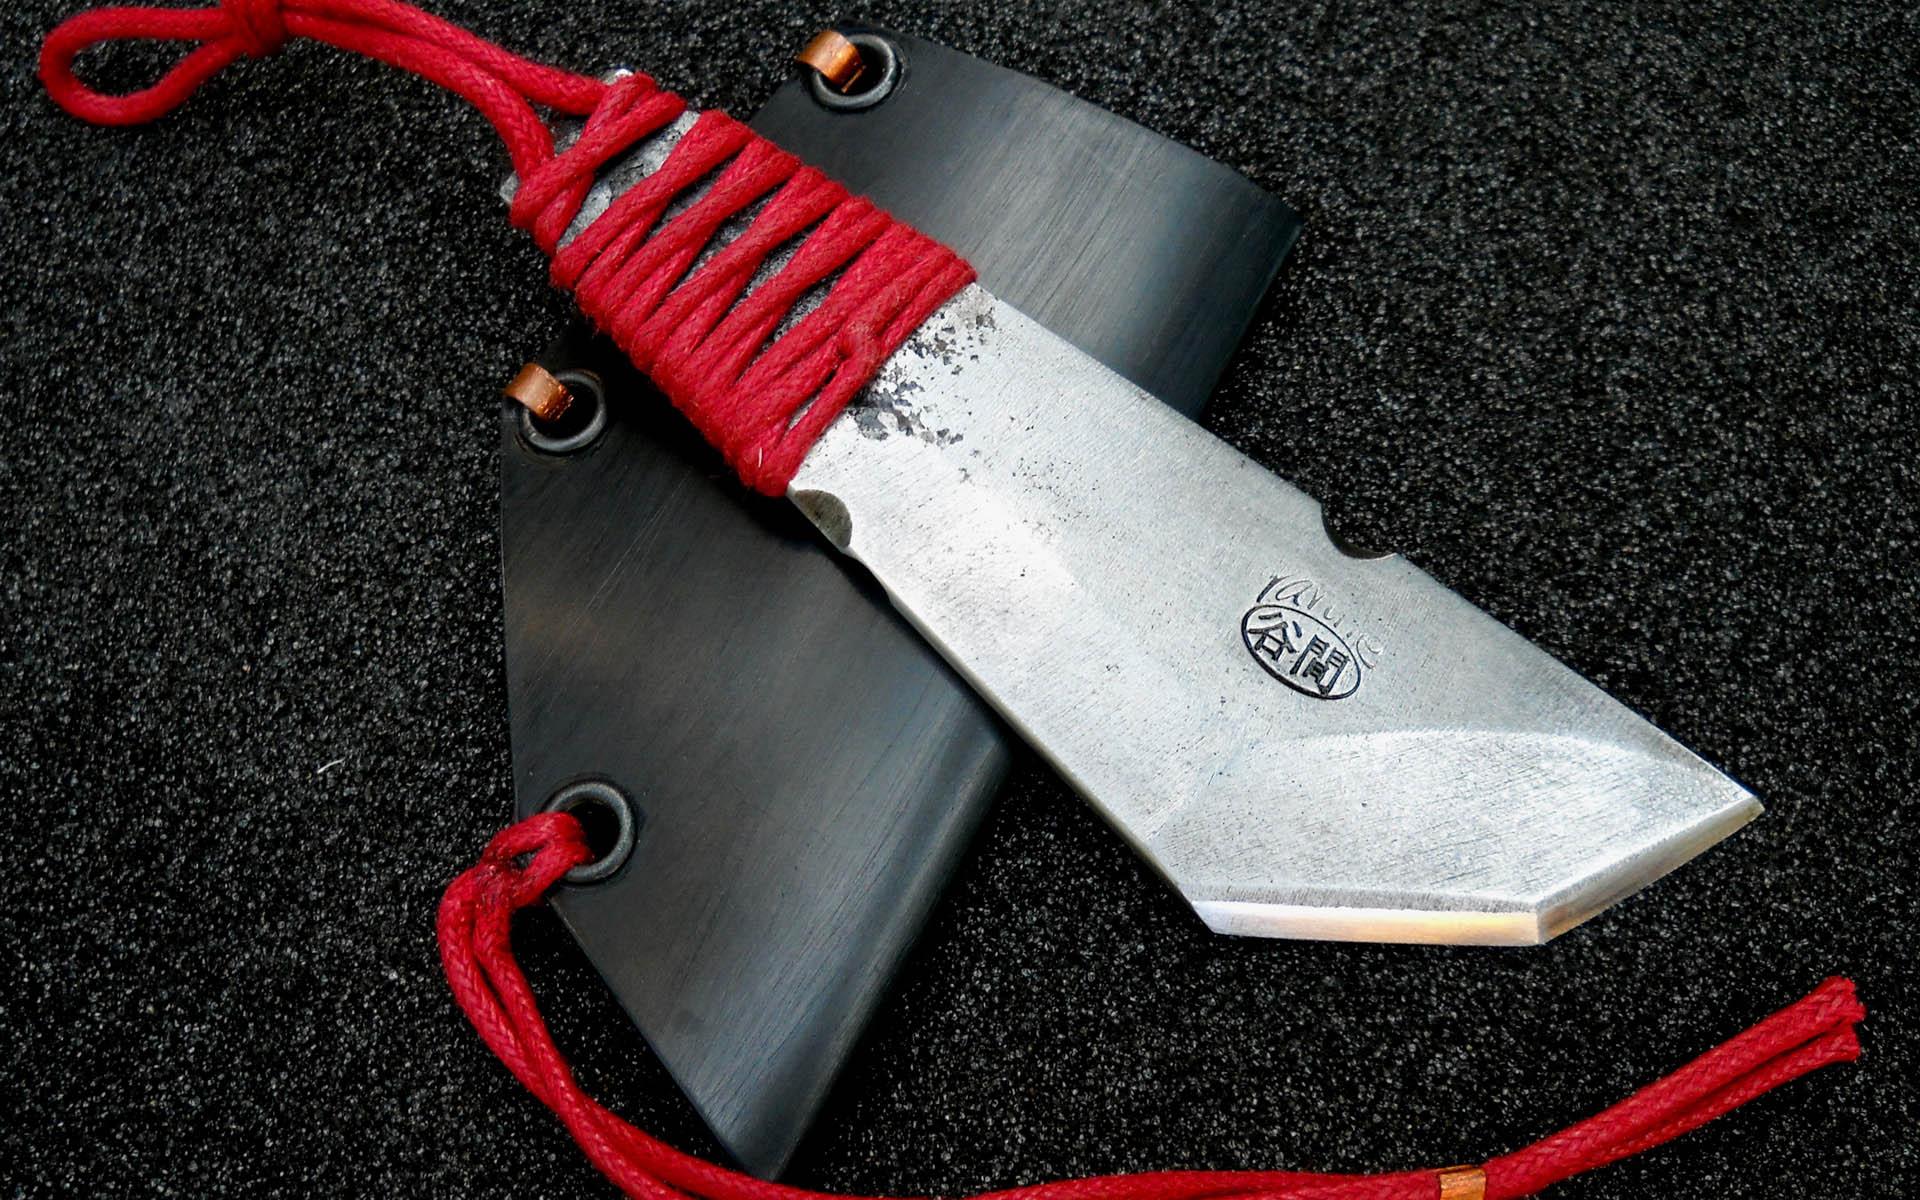 Боевые ножи картинки